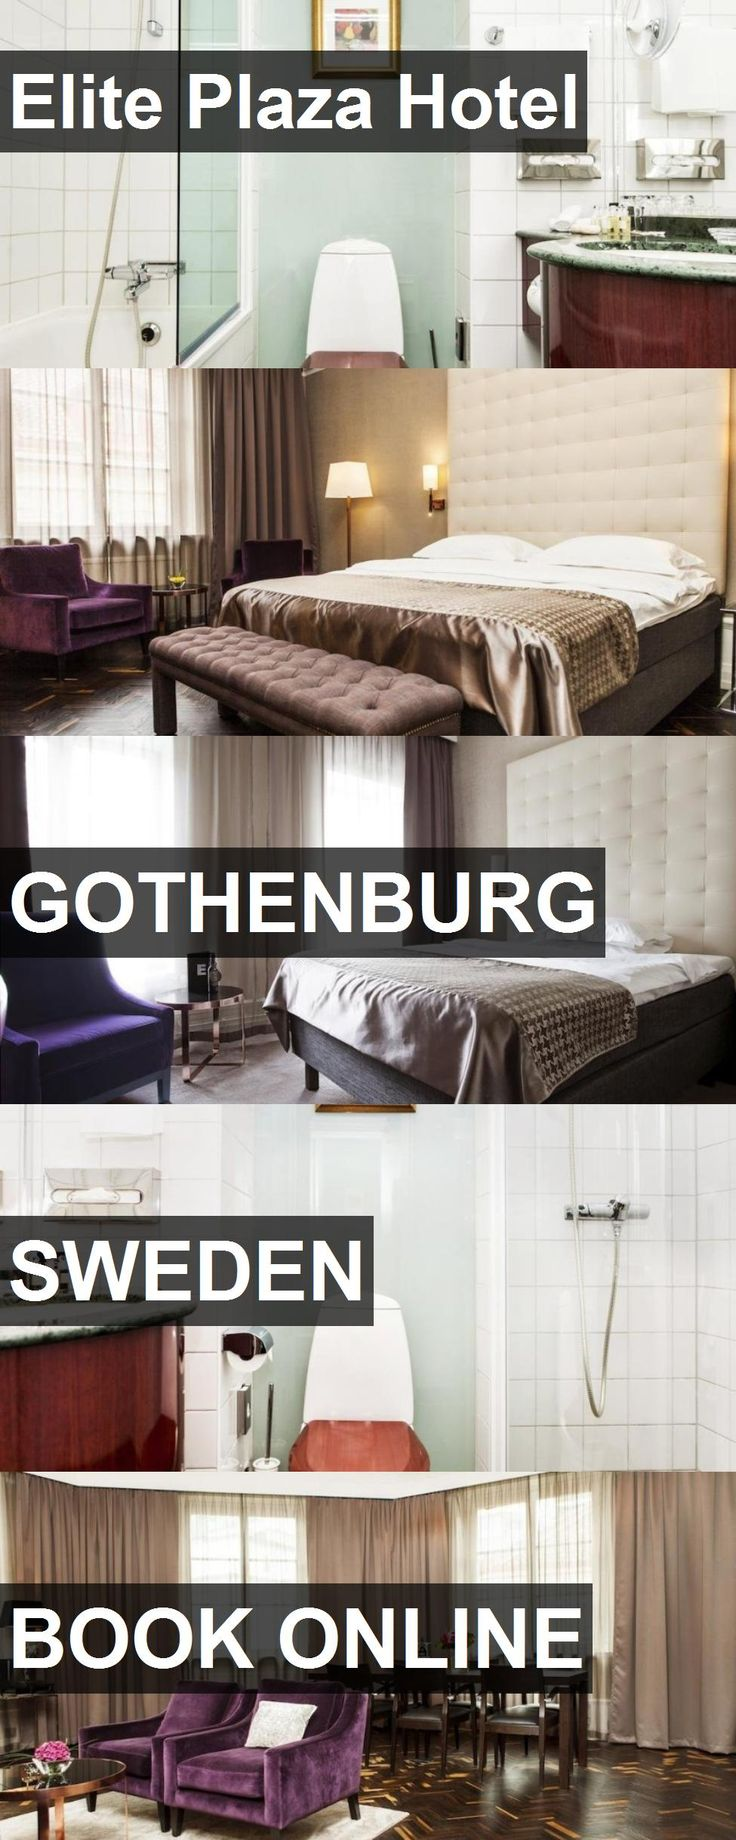 Hotel Elite Plaza Hotel in Gothenburg, Sweden. For more information, photos, reviews and best prices please follow the link. #Sweden #Gothenburg #ElitePlazaHotel #hotel #travel #vacation